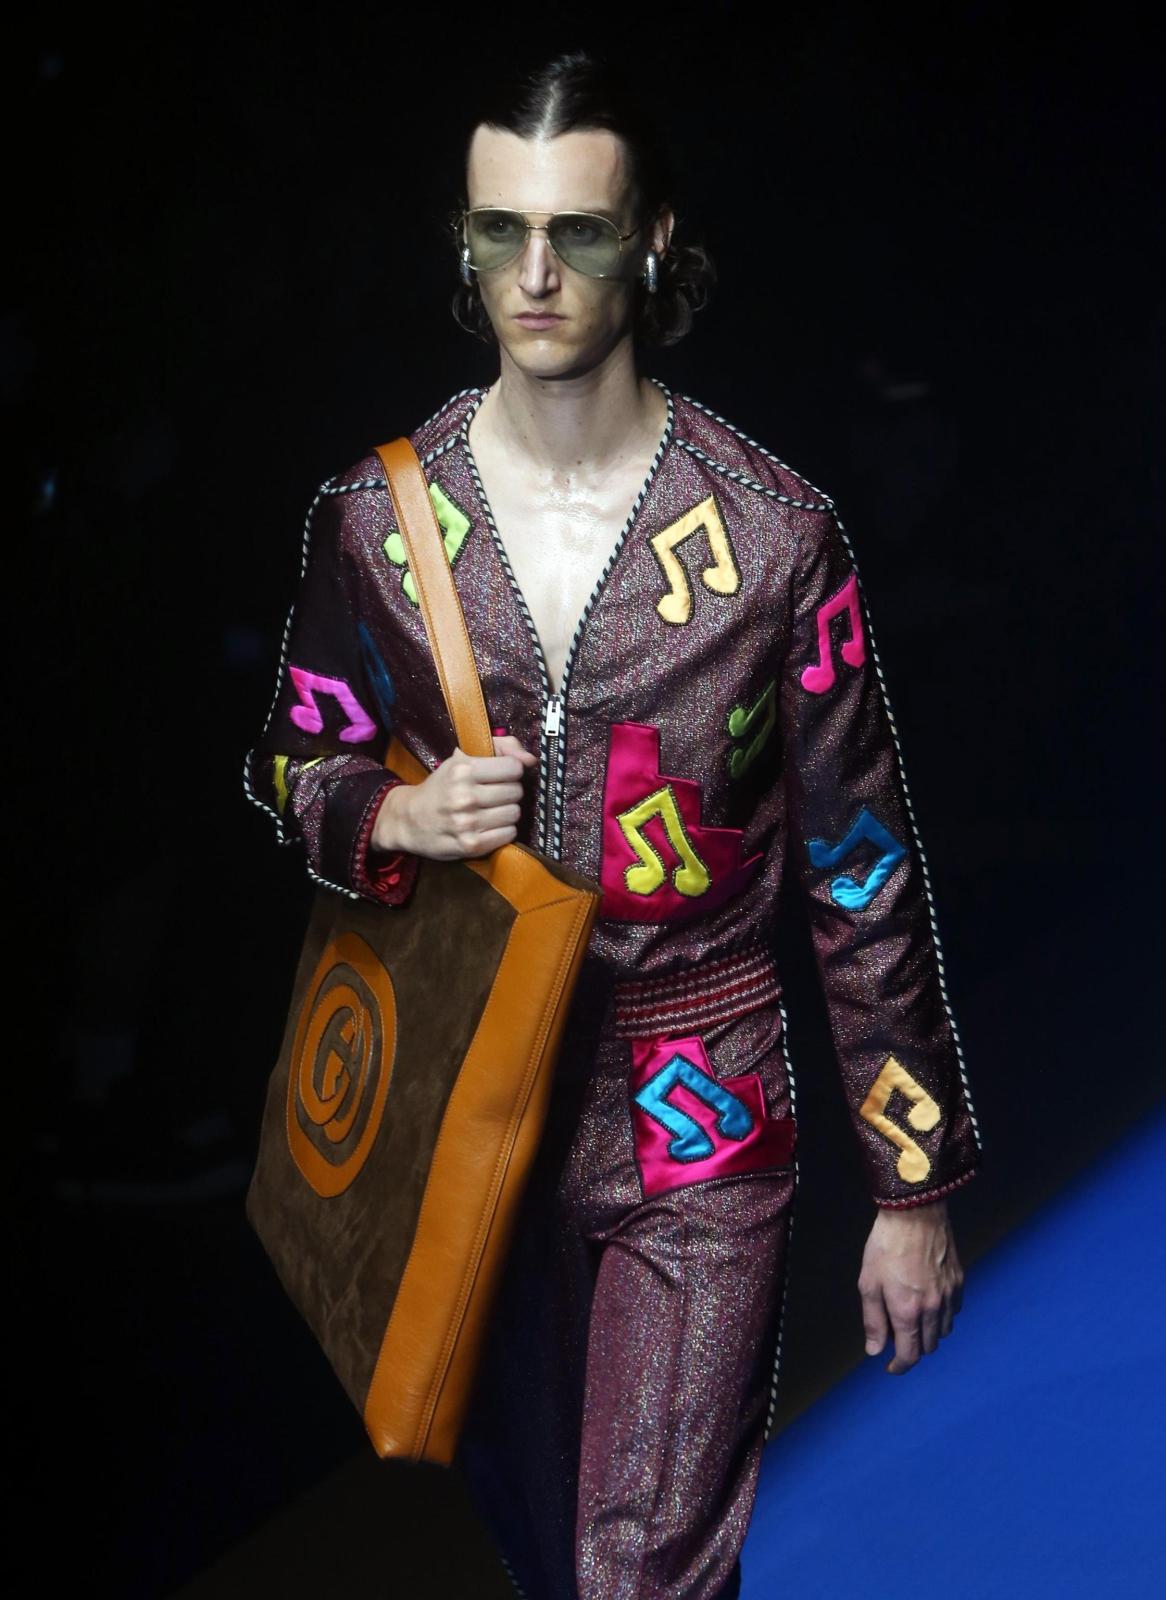 Mediolan Fashion Week, EPA/MATTEO BAZZI